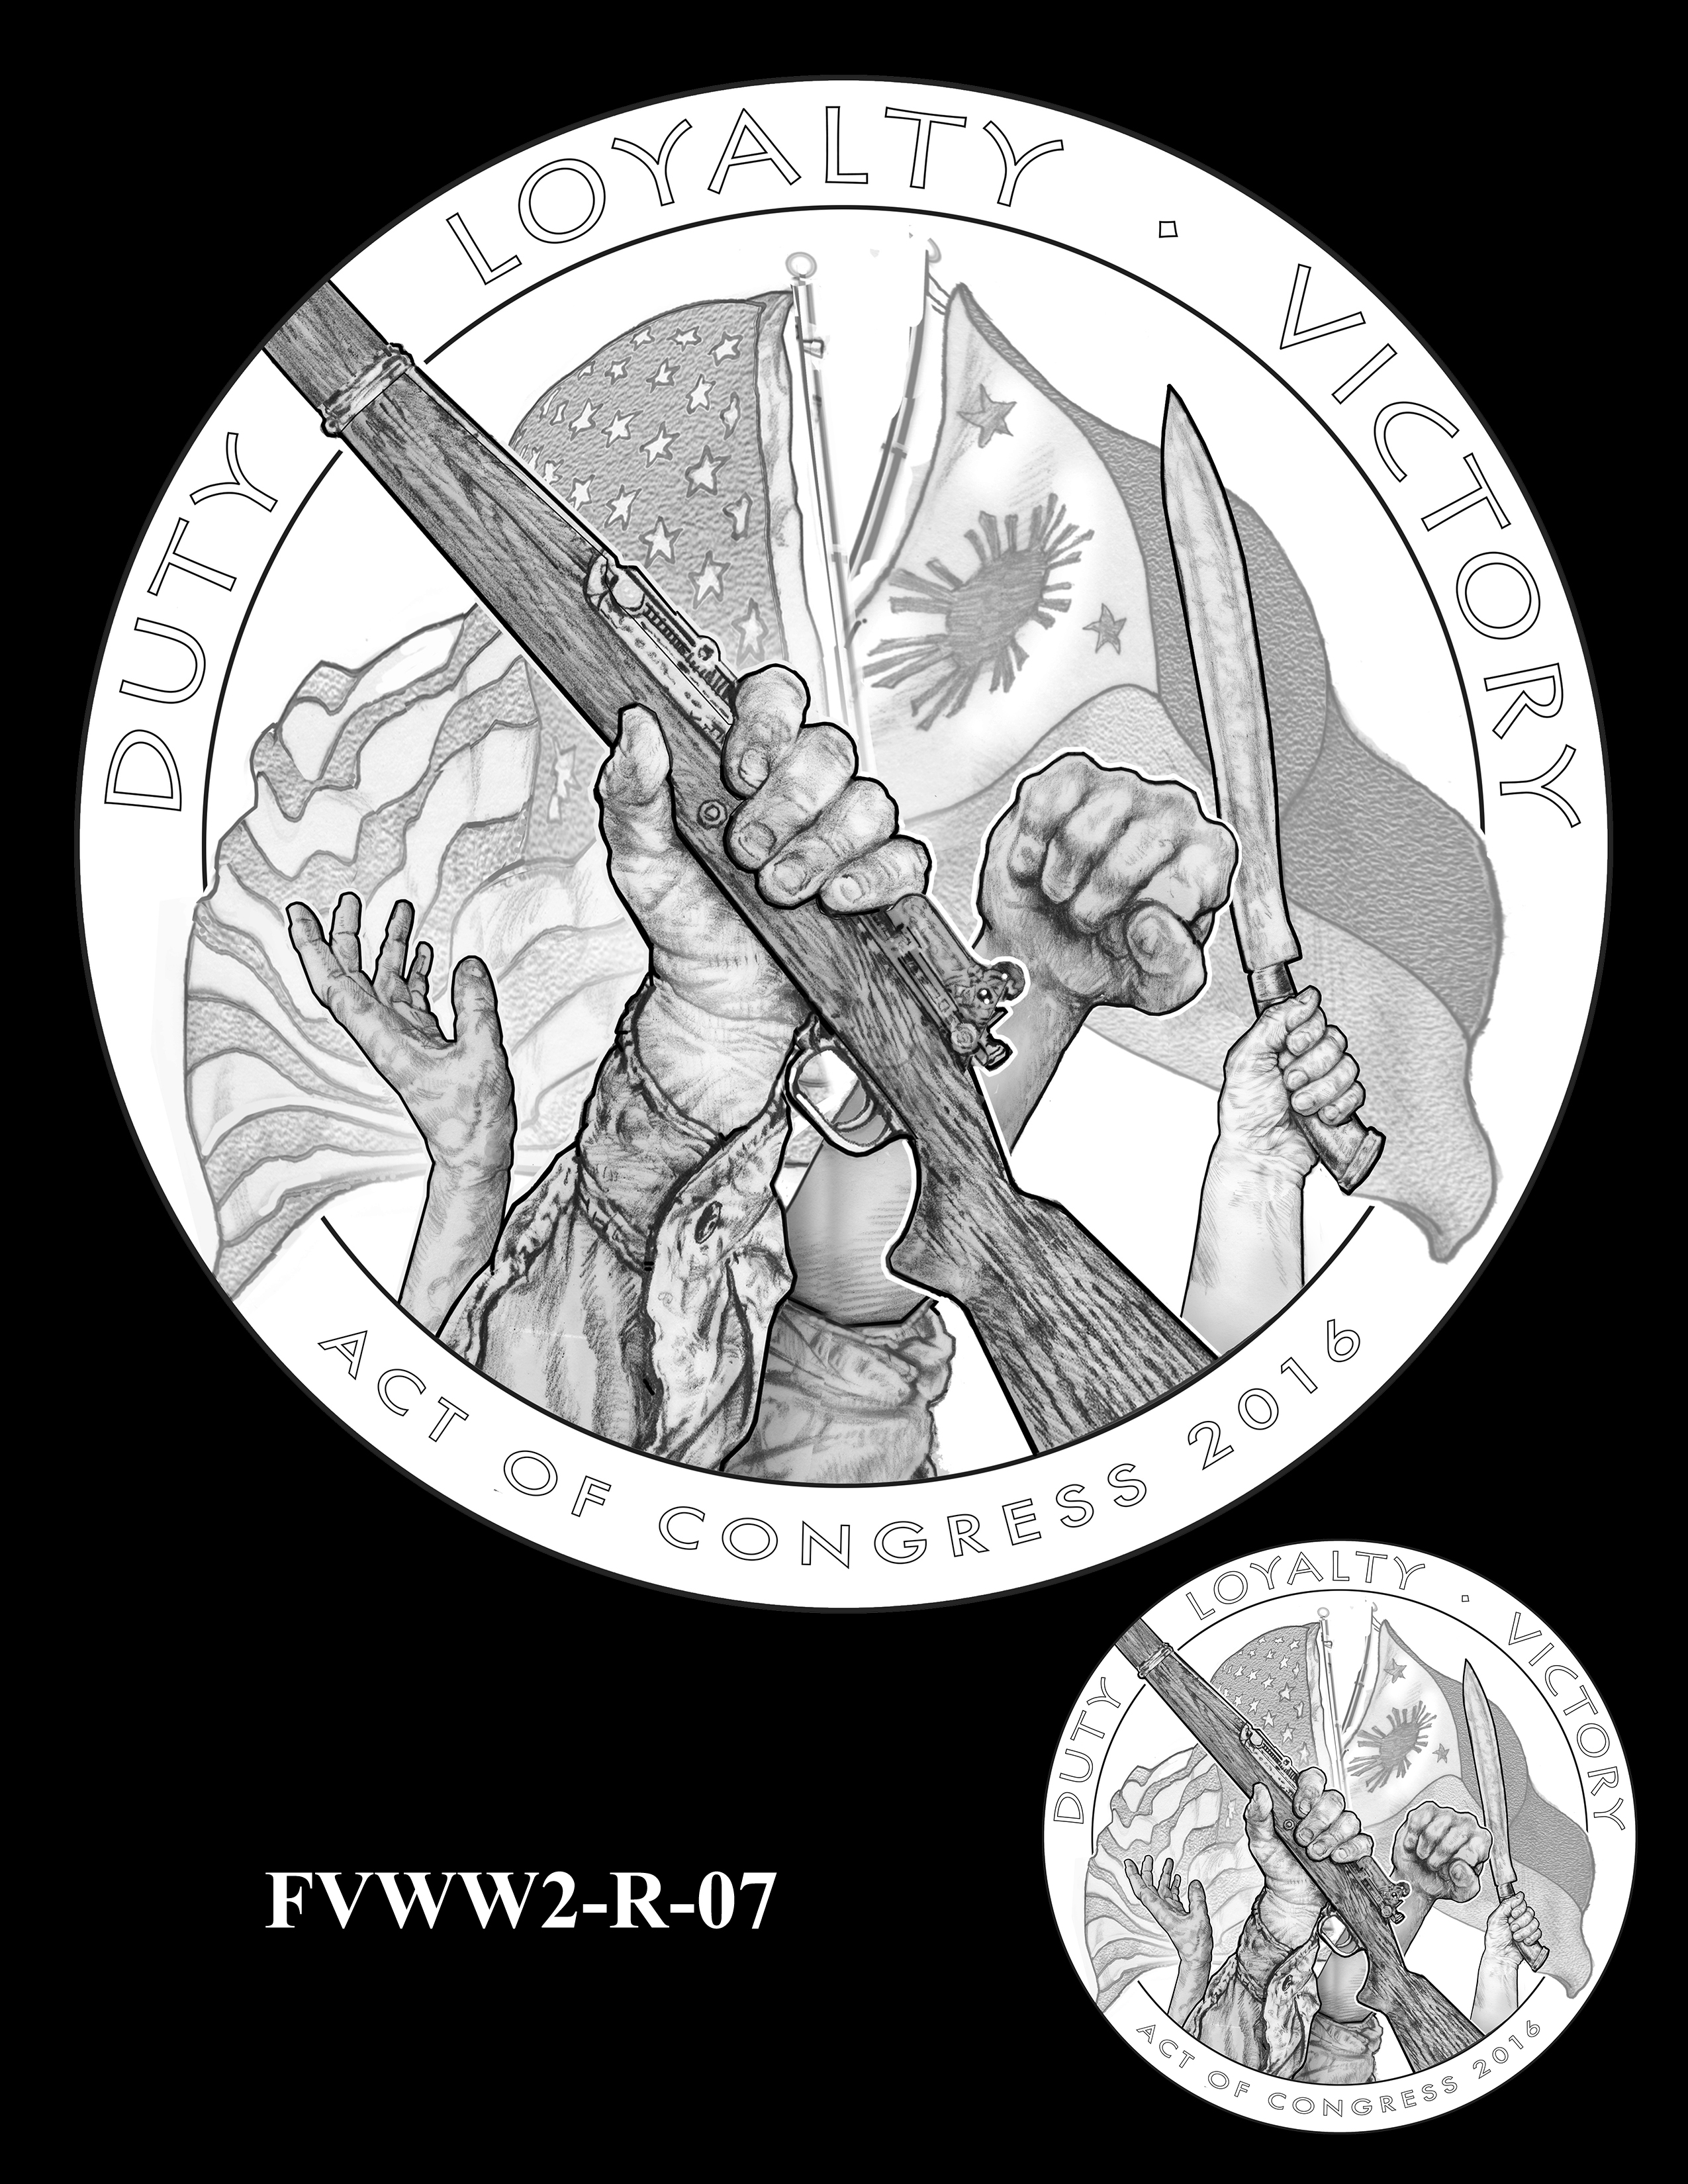 FVWW2-R-07 -- Filipino Veterans of World War II Congressional Gold Medal